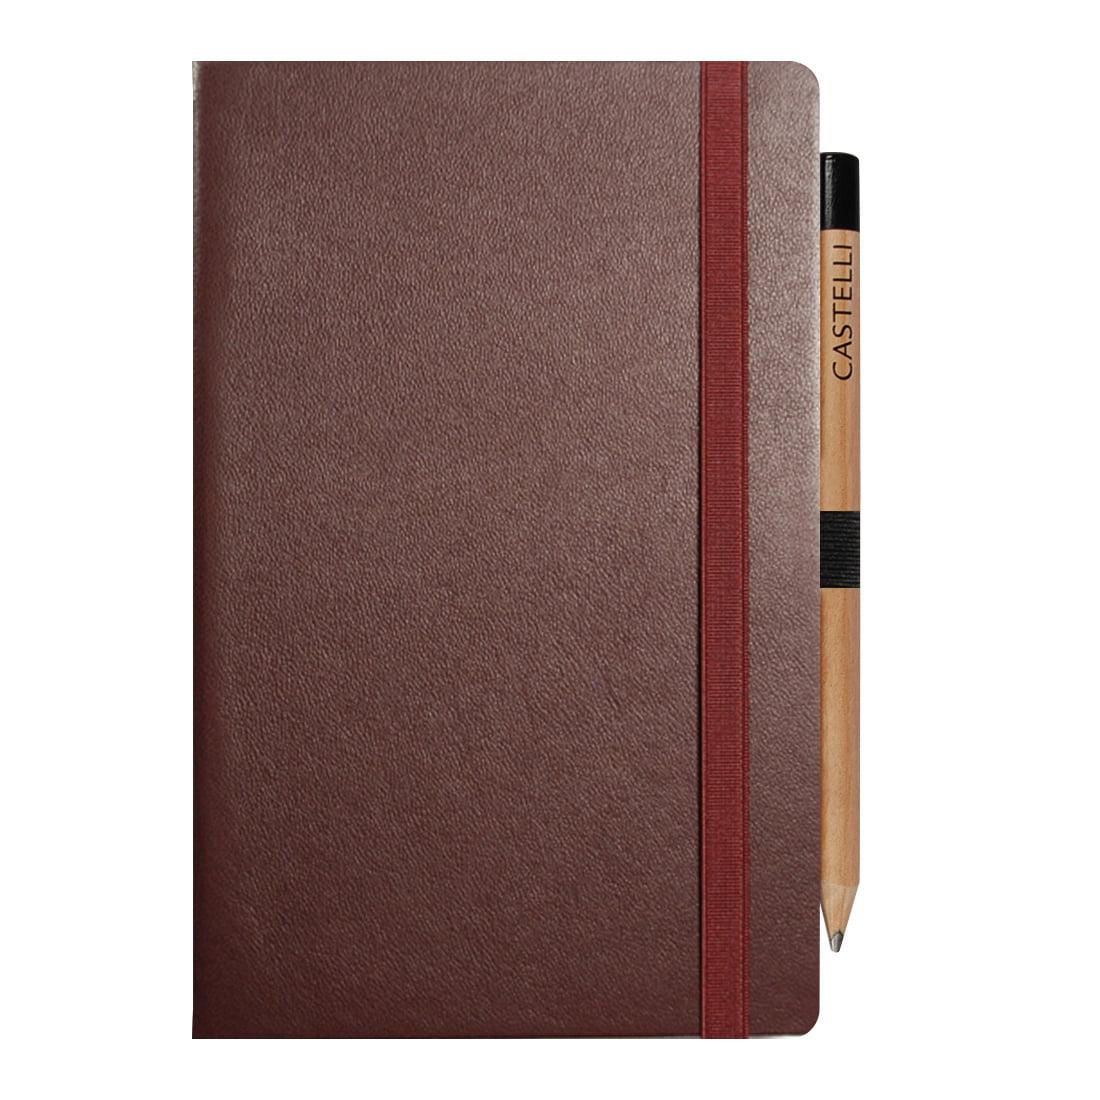 Nappa leather Q24/06/227 burgundy